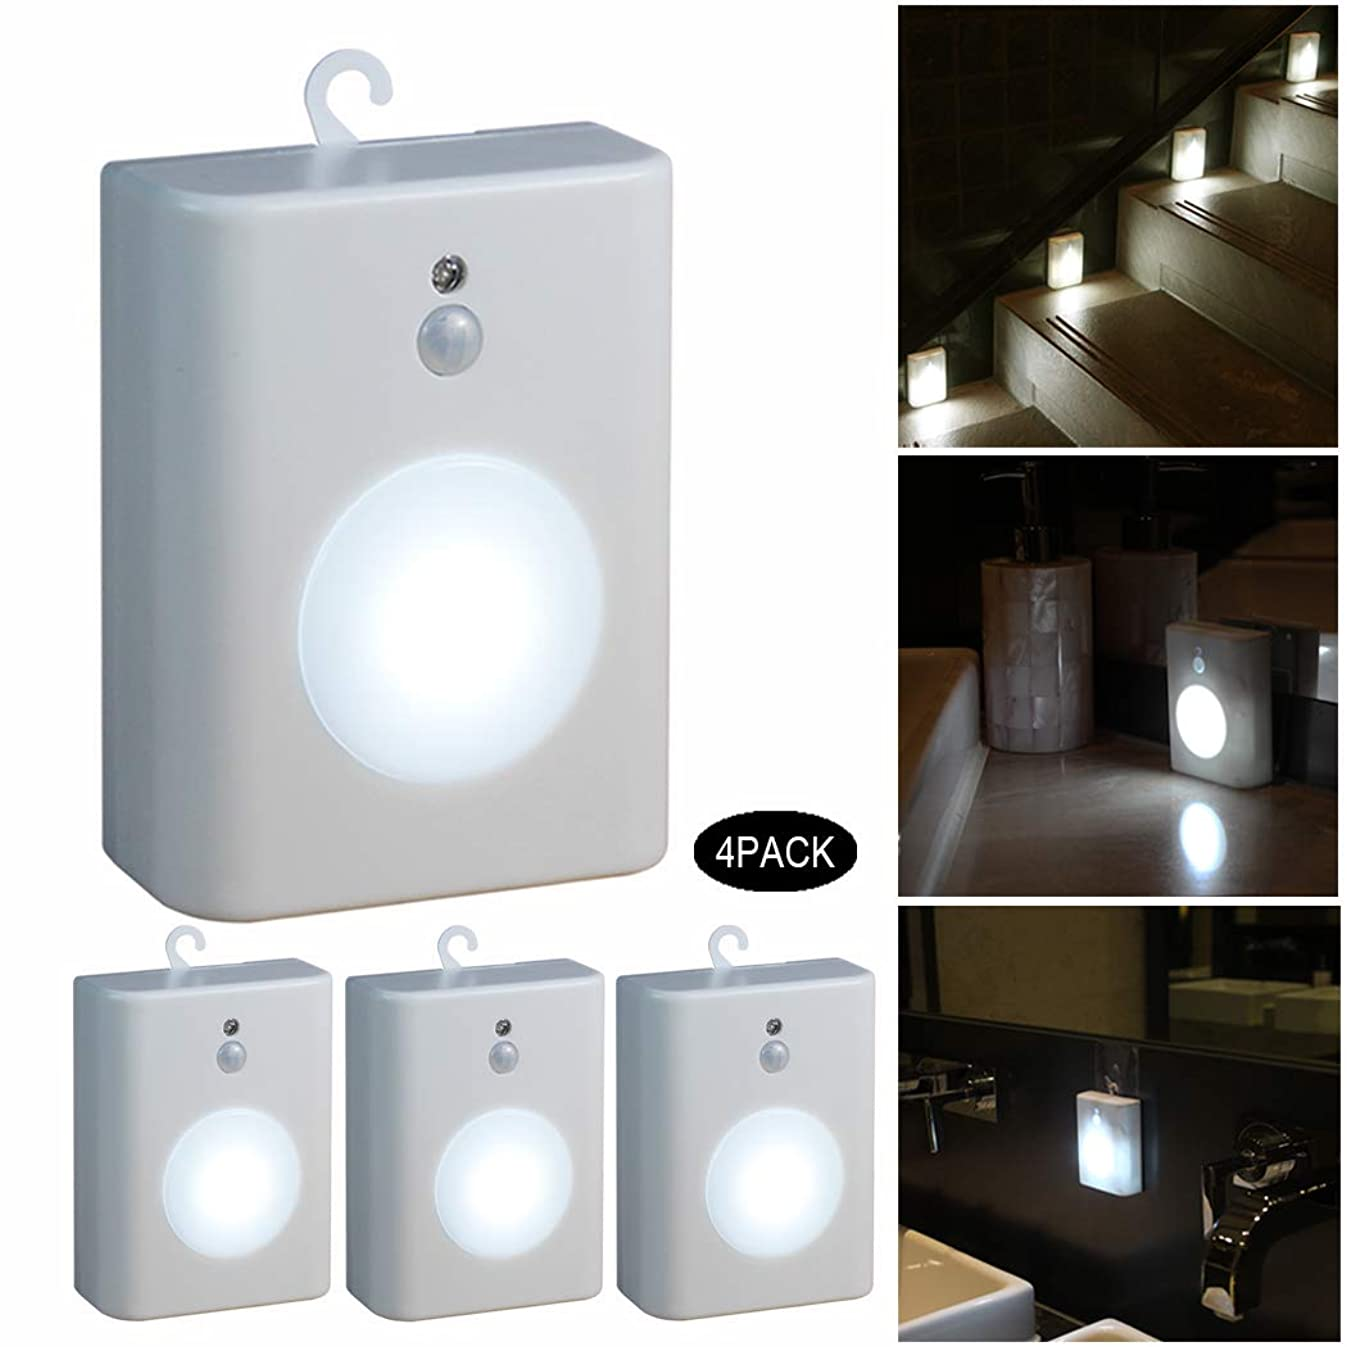 WRalwaysLX Motion Sensor LED Nightlight, Battery-Powered Cool Light,Step Light for Stair,Hall,Closet,Bathroom,Kitchen,Cabinet, Stick-Anywhere,0.5W LED, 4 Pack White